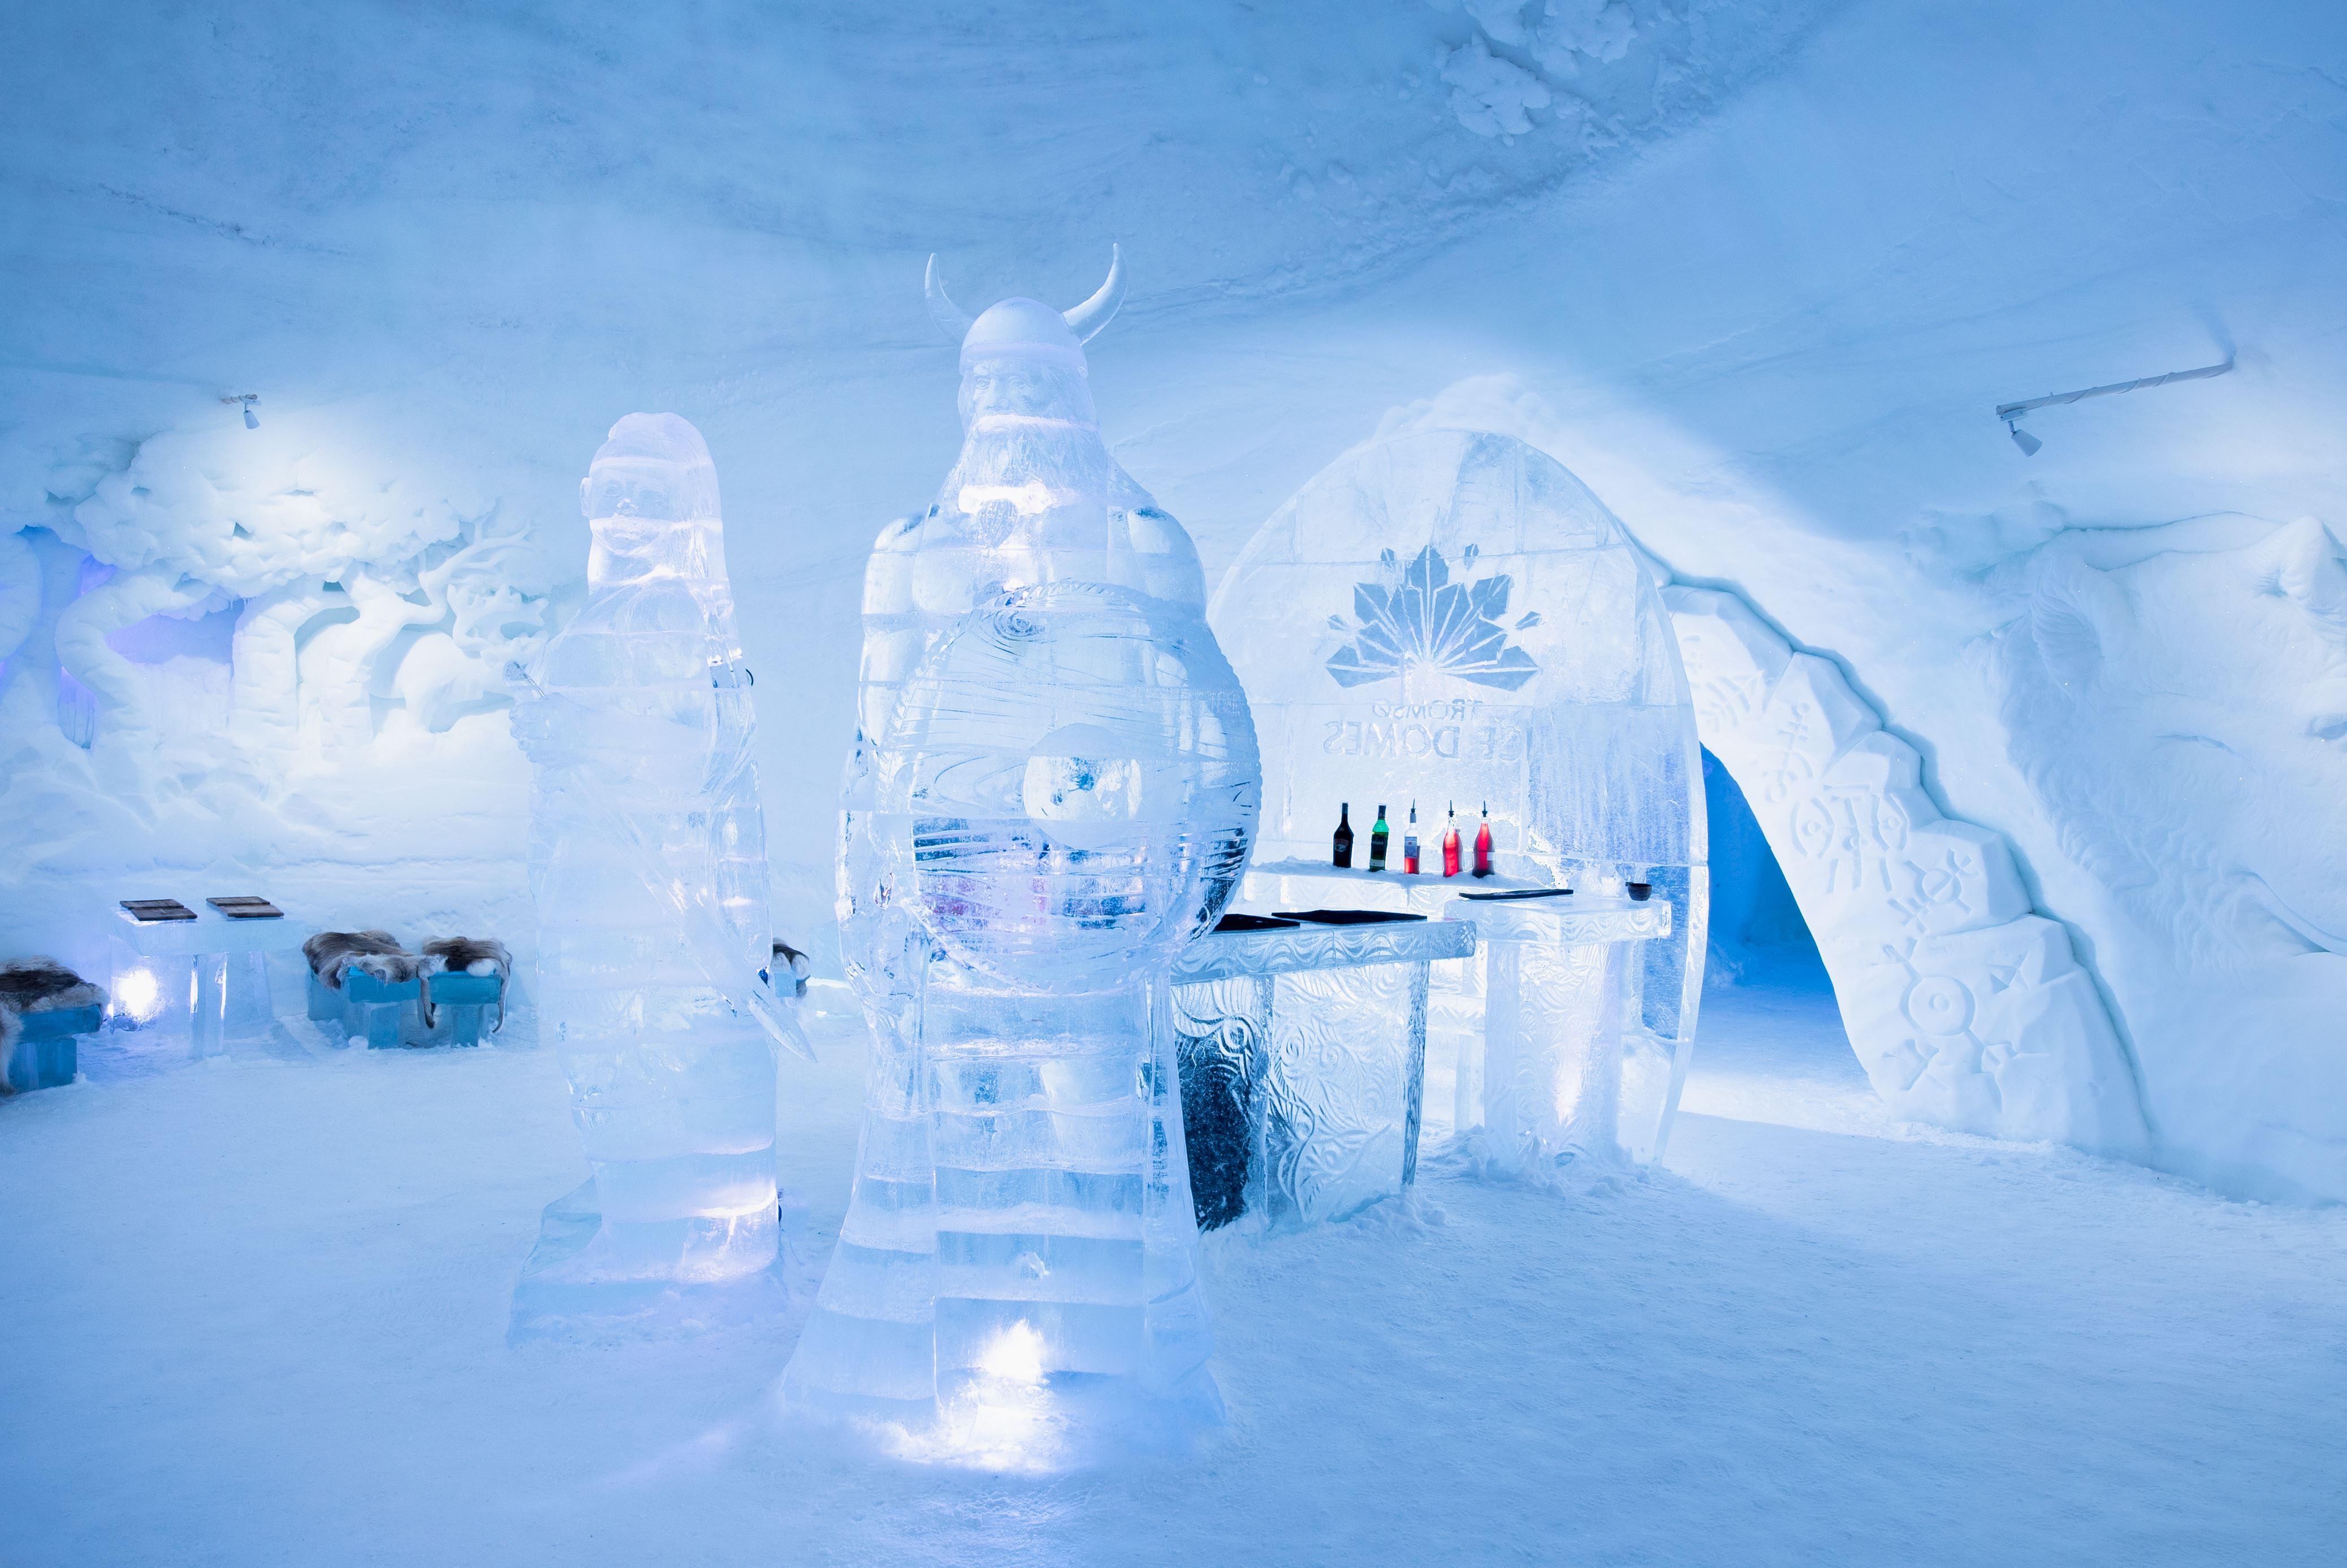 Tromsø Ice Domes visit (day visit to an ice hotel) - Destination Tromsø